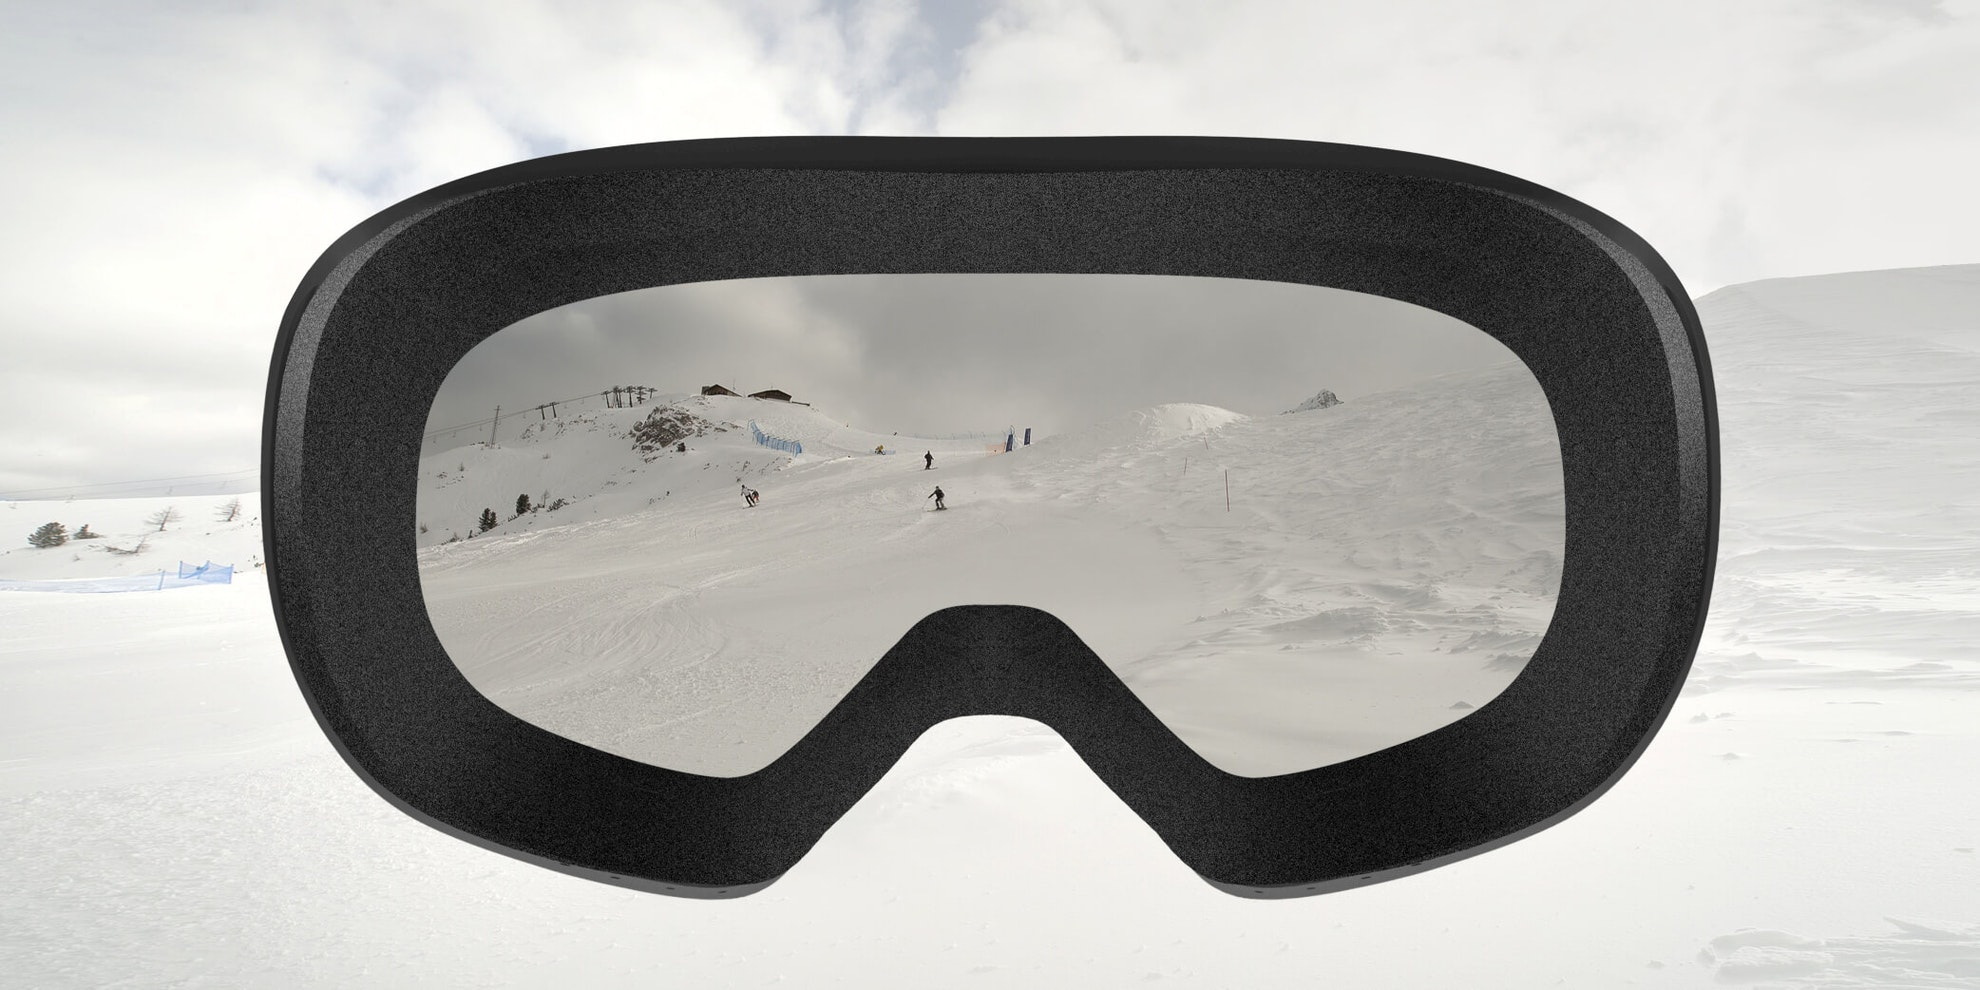 Standard goggles